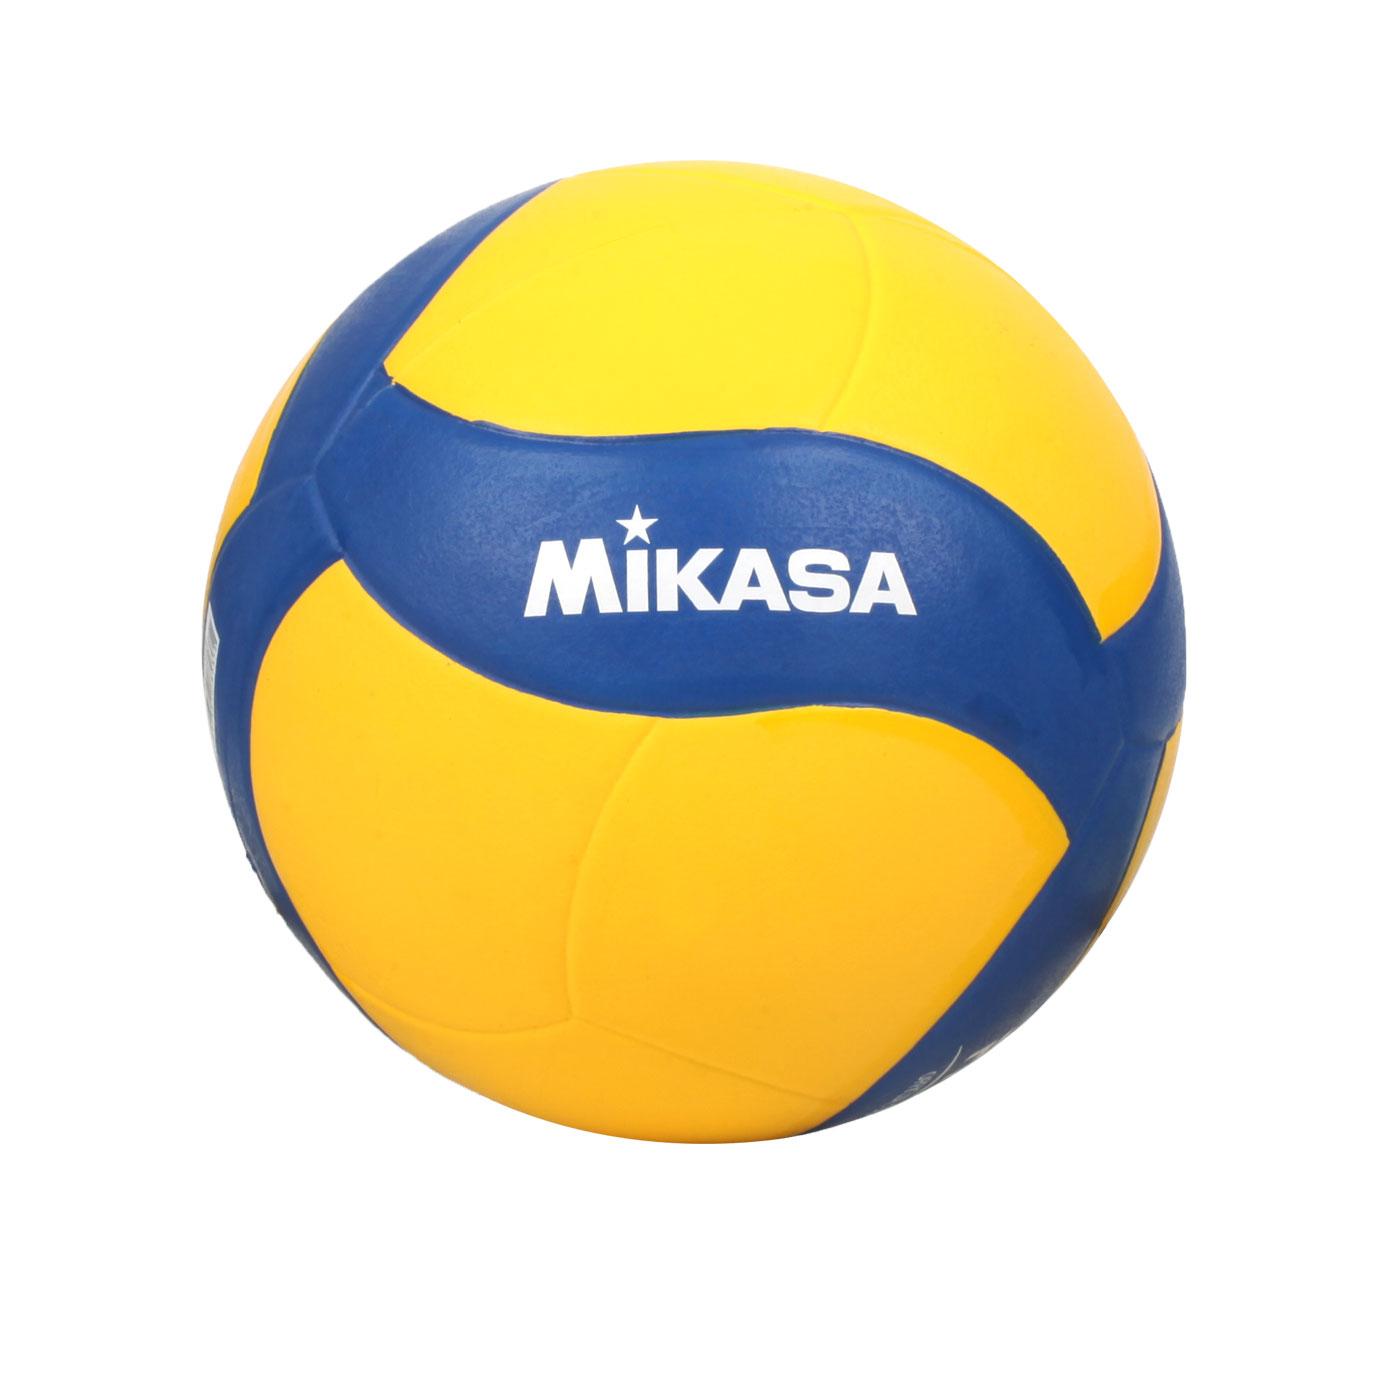 MIKASA 螺旋形軟橡膠排球 #5 MKV020WS